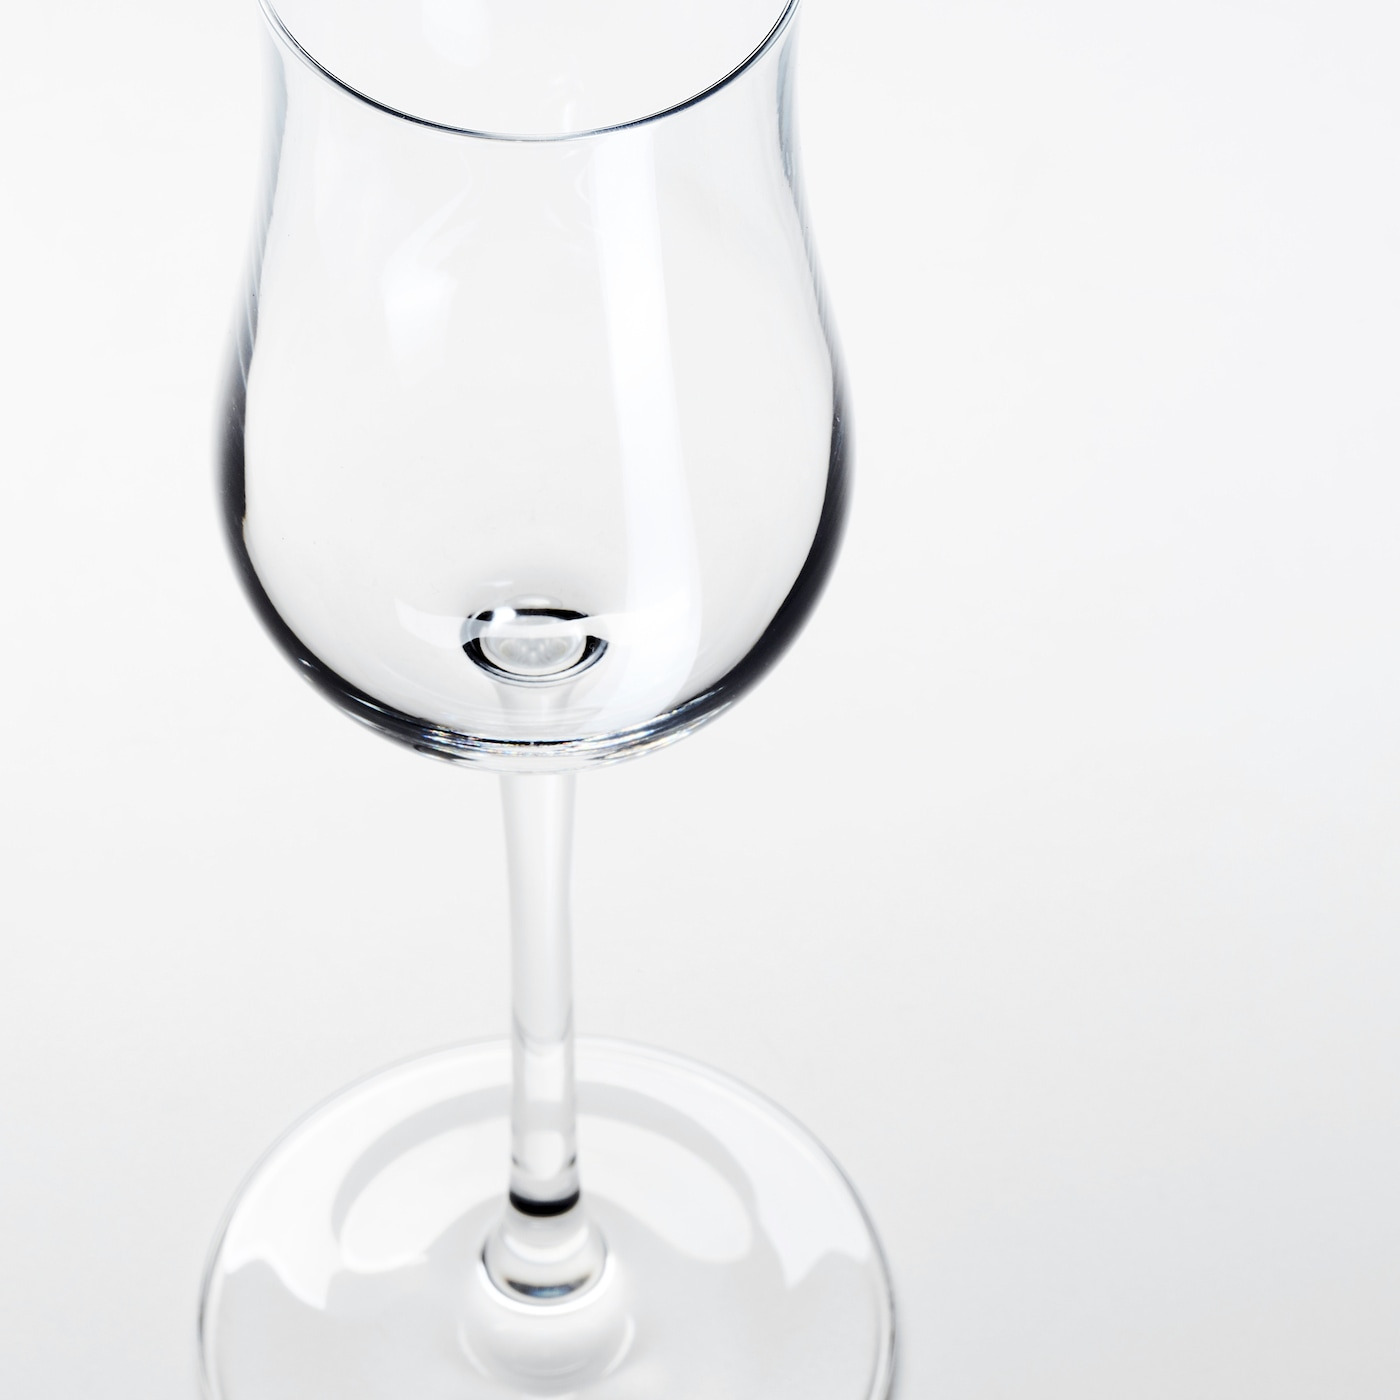 STORSINT Dessert wine glass, clear glass, 15 cl